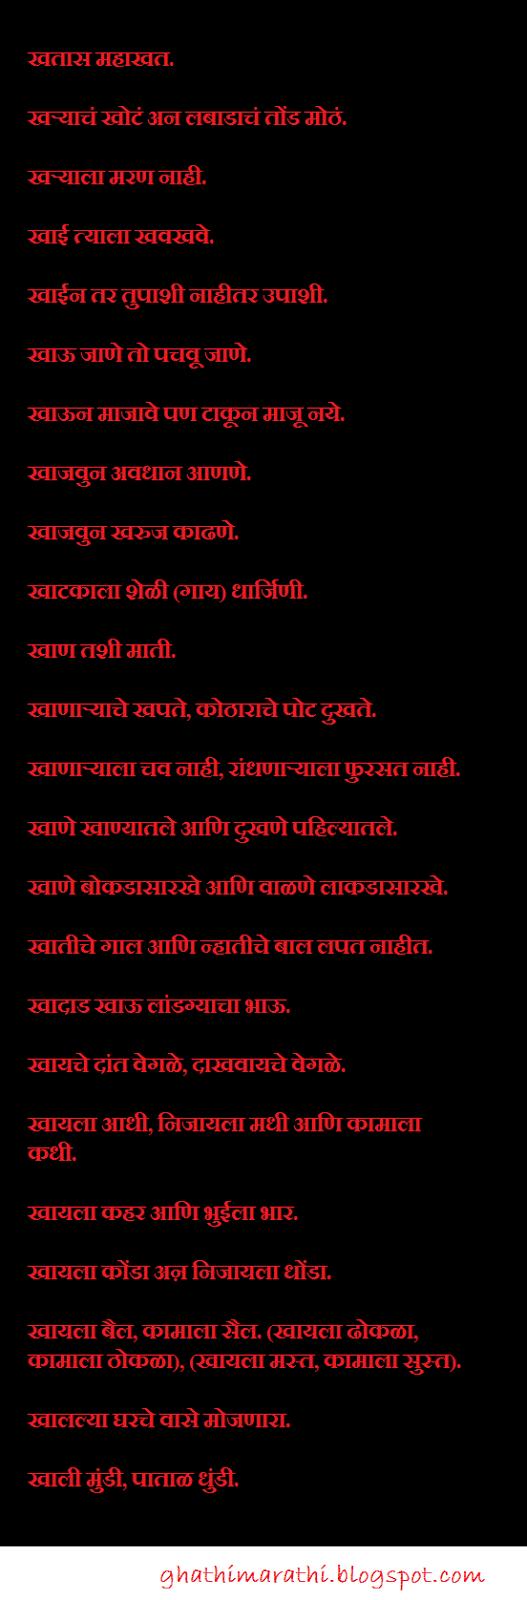 marathi mhani starting from kha1